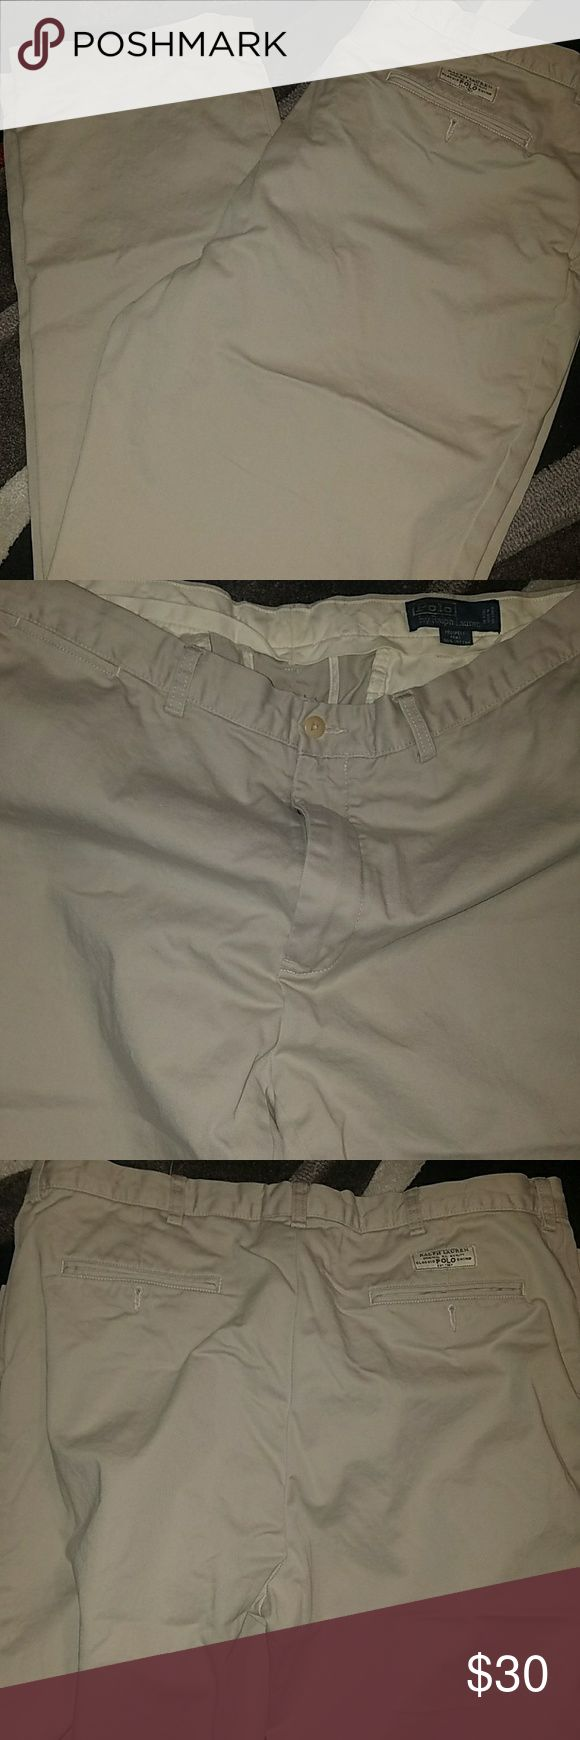 Mens khaki pants Ralph Lauren Polo Classic chino pants Ralph Lauren Pants Chinos & Khakis